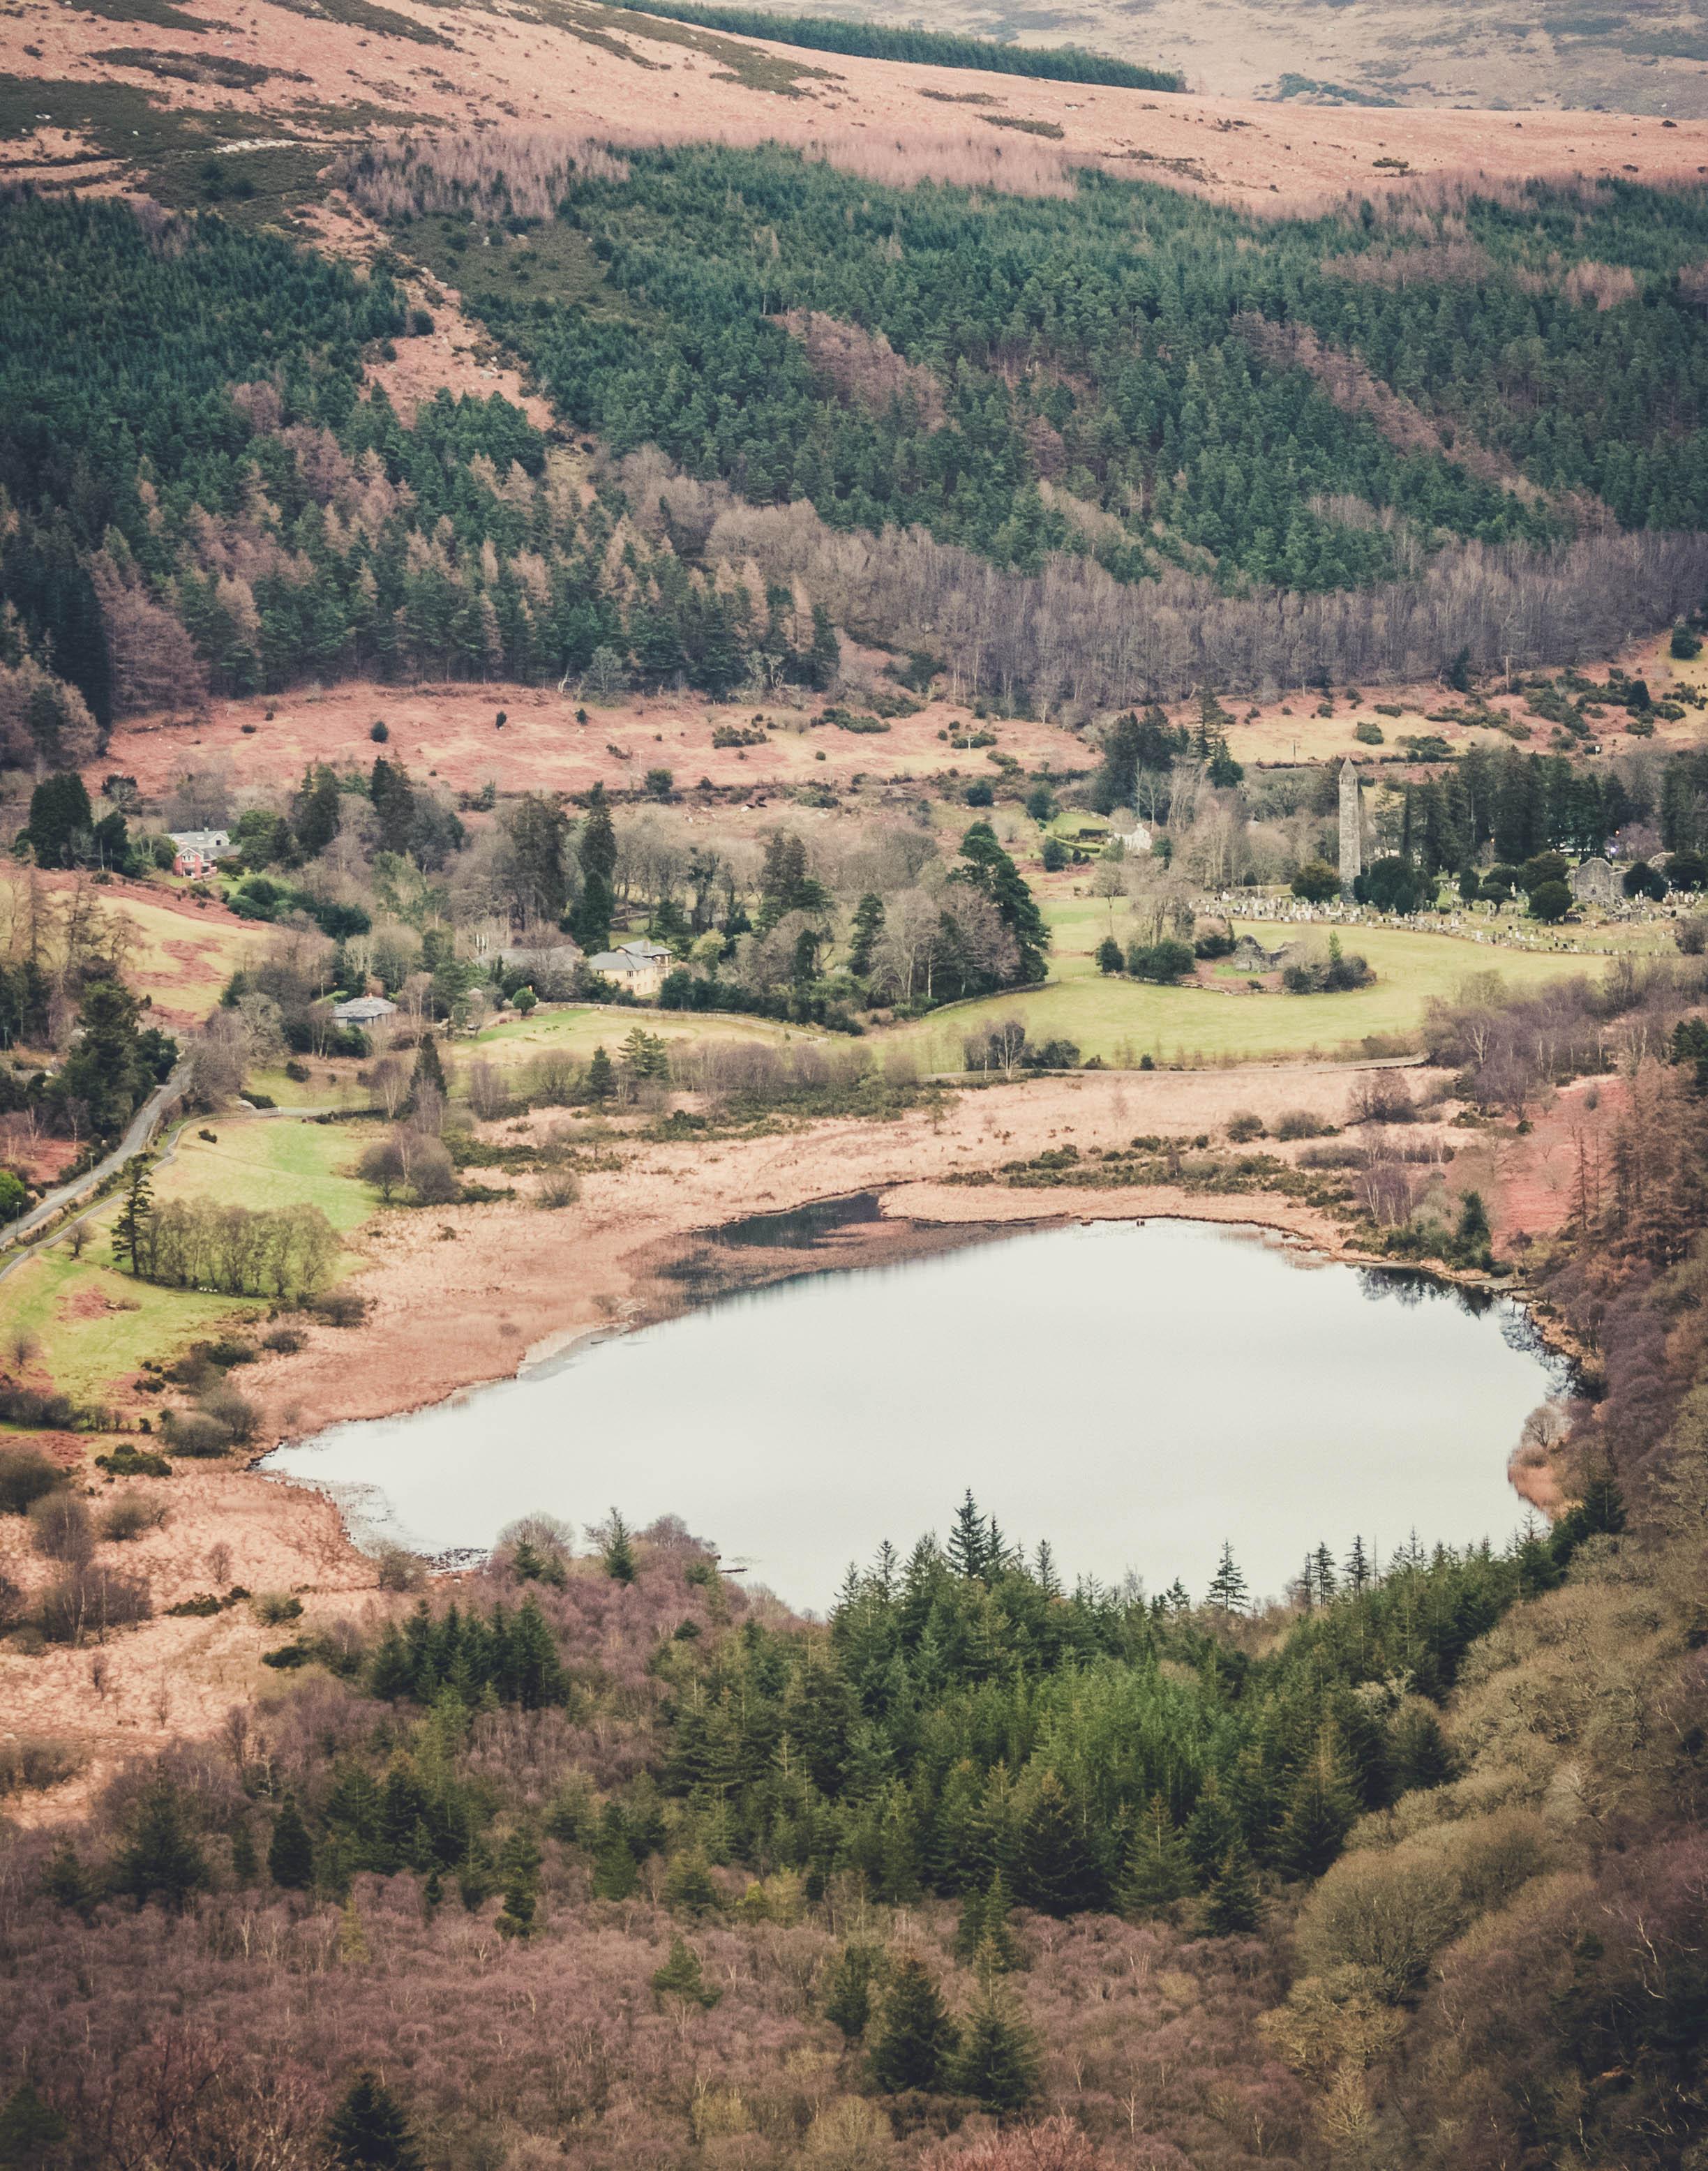 glendalough. irish history. county wicklow. round tower. hill walknig. hiking. grave yard. wildlife. tombstones. lakes. blue sky. over the lake.jpg